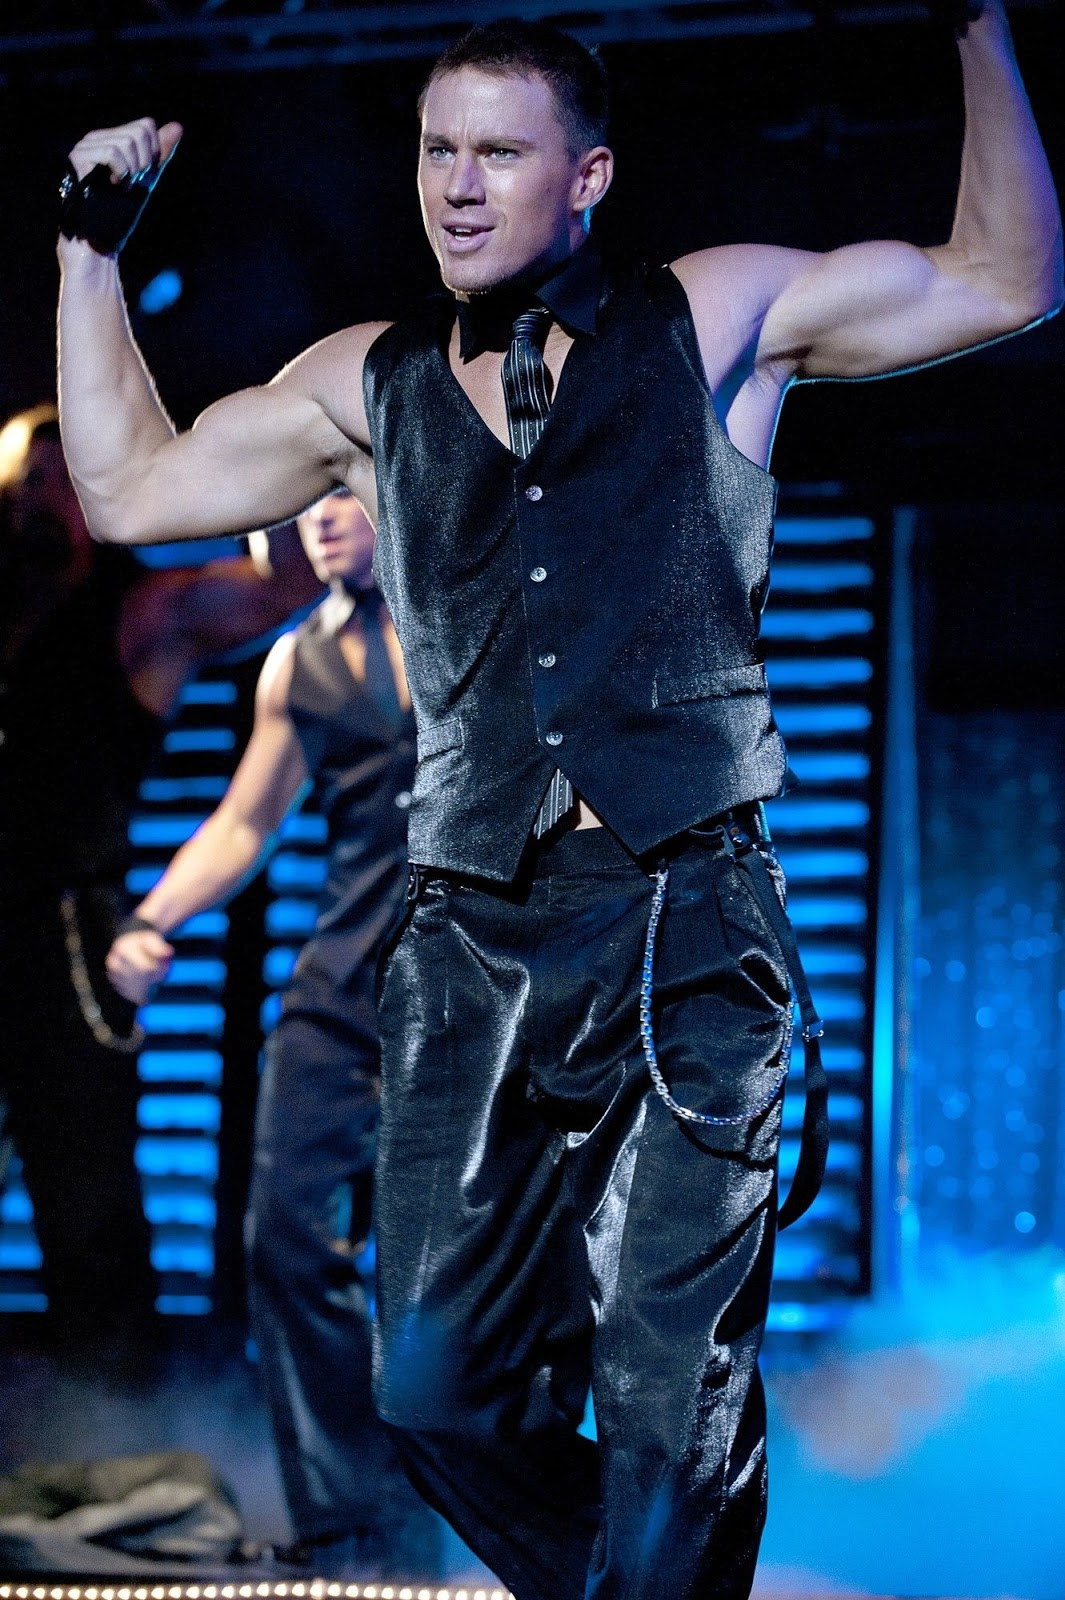 http://2.bp.blogspot.com/-uhNSRFNdO9M/UNFFx7rSnmI/AAAAAAAALMo/fZixPRXEY6M/s1600/Channing-Tatum-to-Direct-Magic-Mike-2-06.jpg